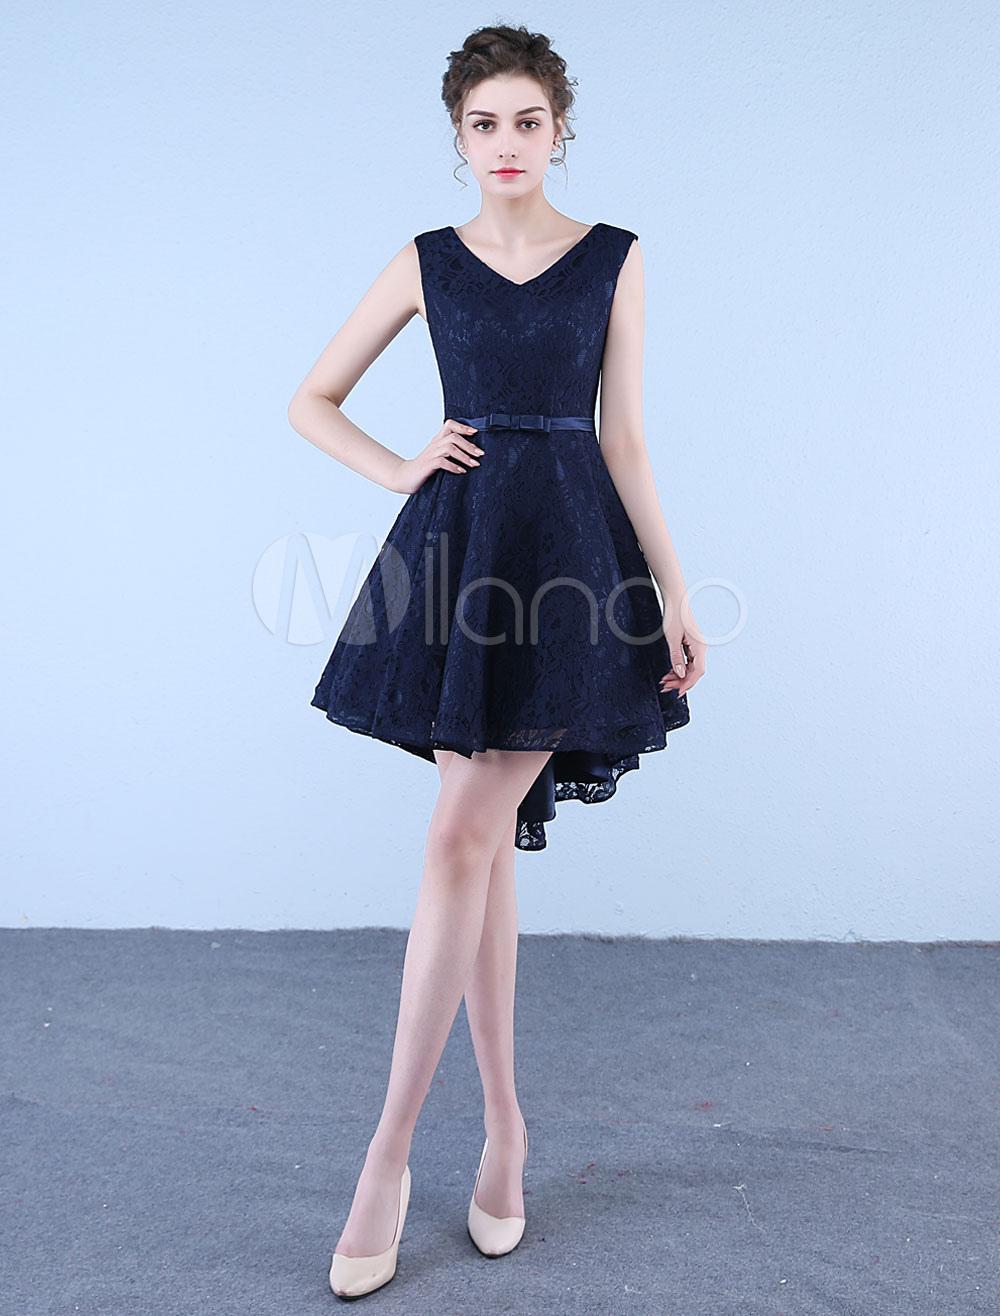 991e0560f06 ... Short Prom Dresses Lace Dark Navy V Neck Bow Sash High Low Asymmetrical  Graduation Dress-. 12. 45%OFF. Color Dark Navy